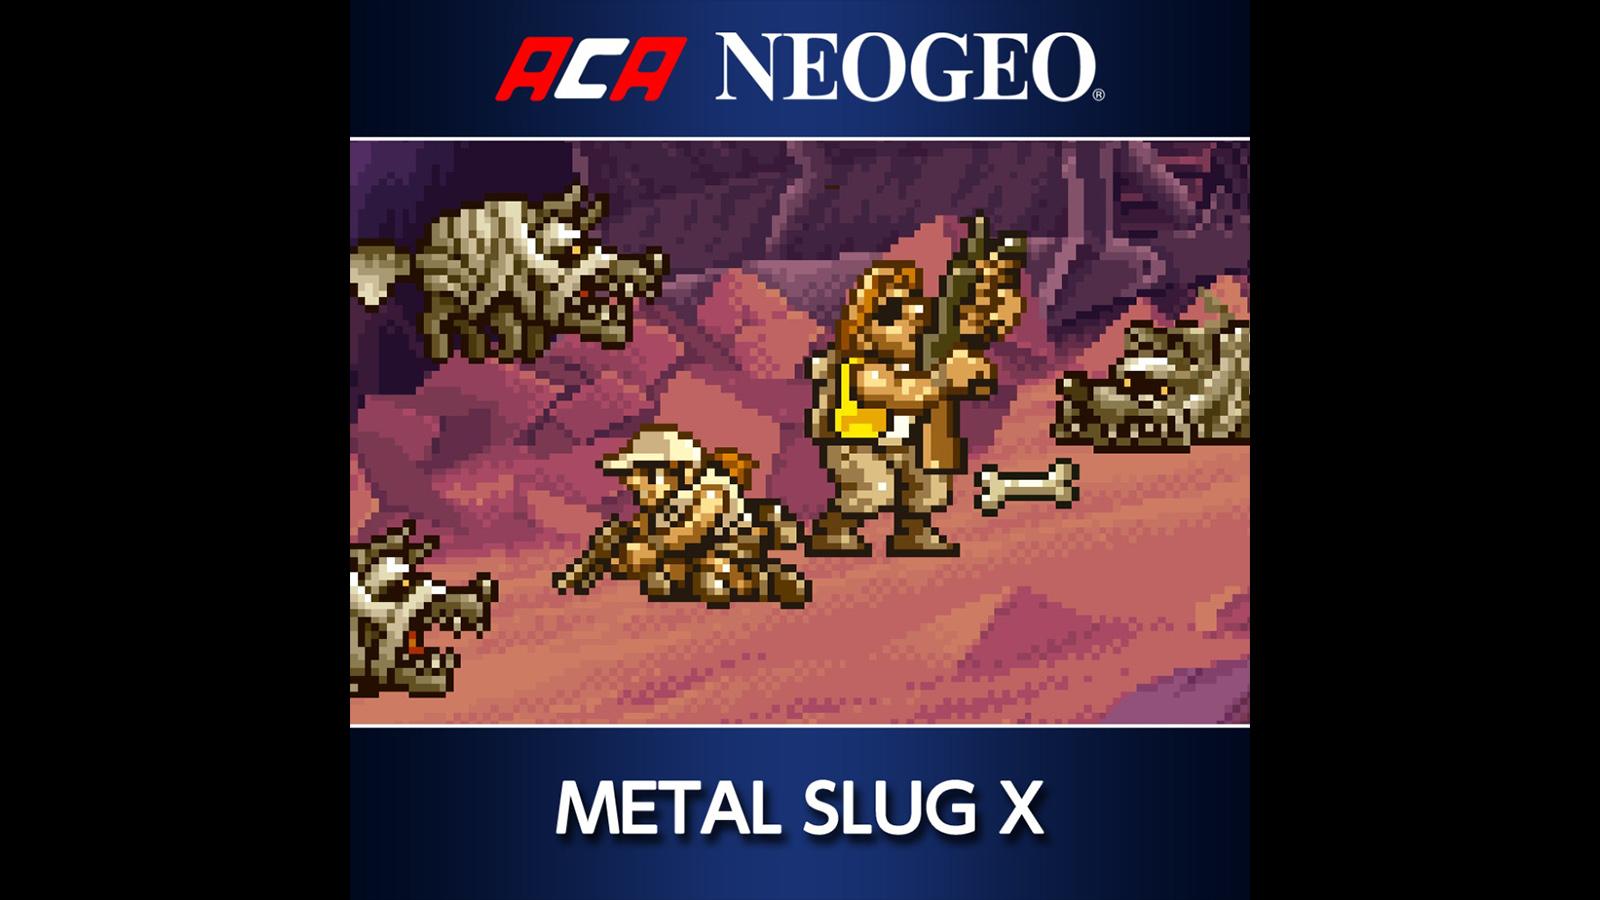 metal slug x neo geo